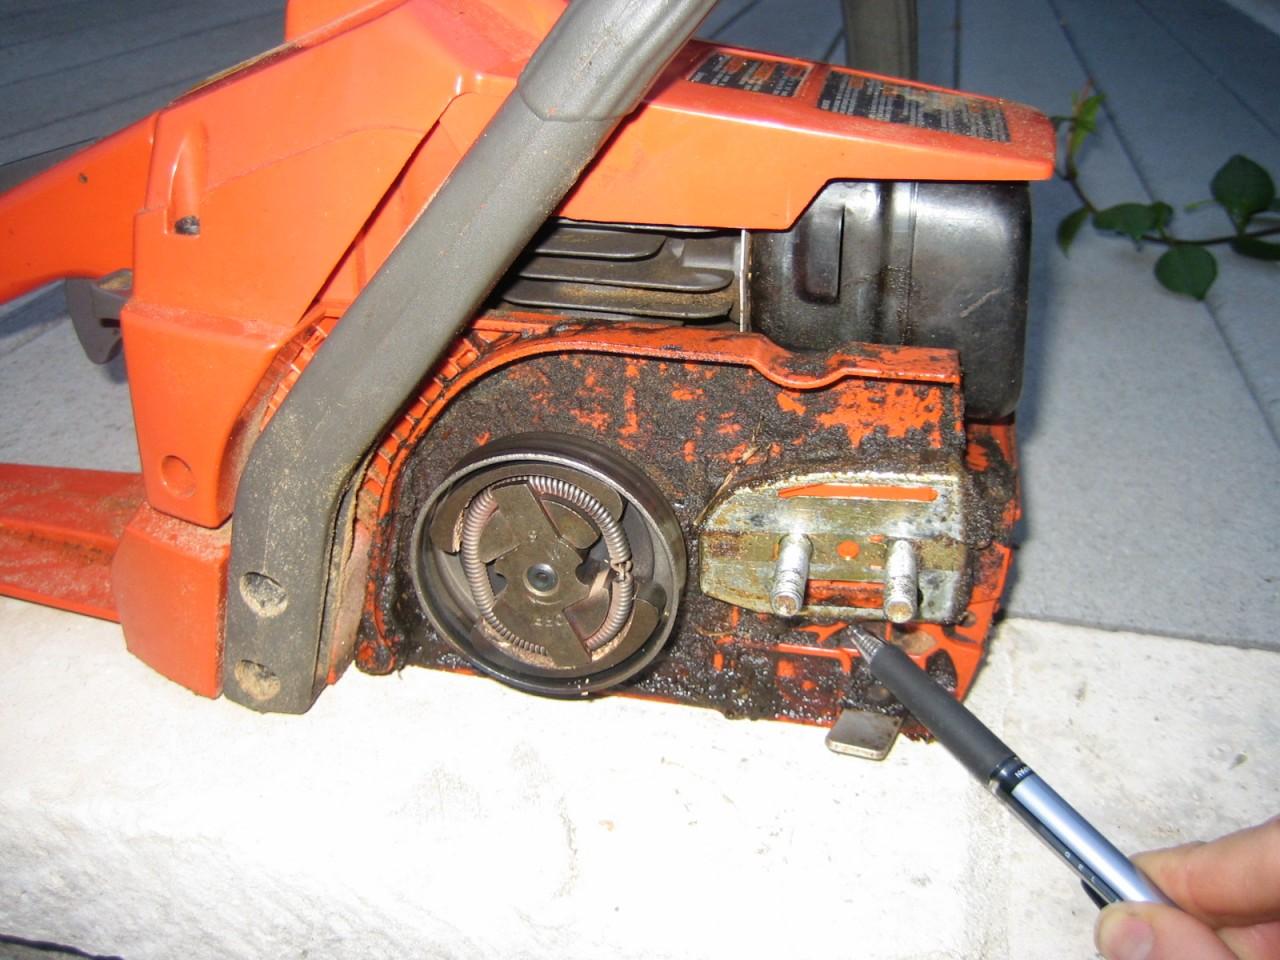 Service Maintenance Question John Husqvarna 141 Chainsaw